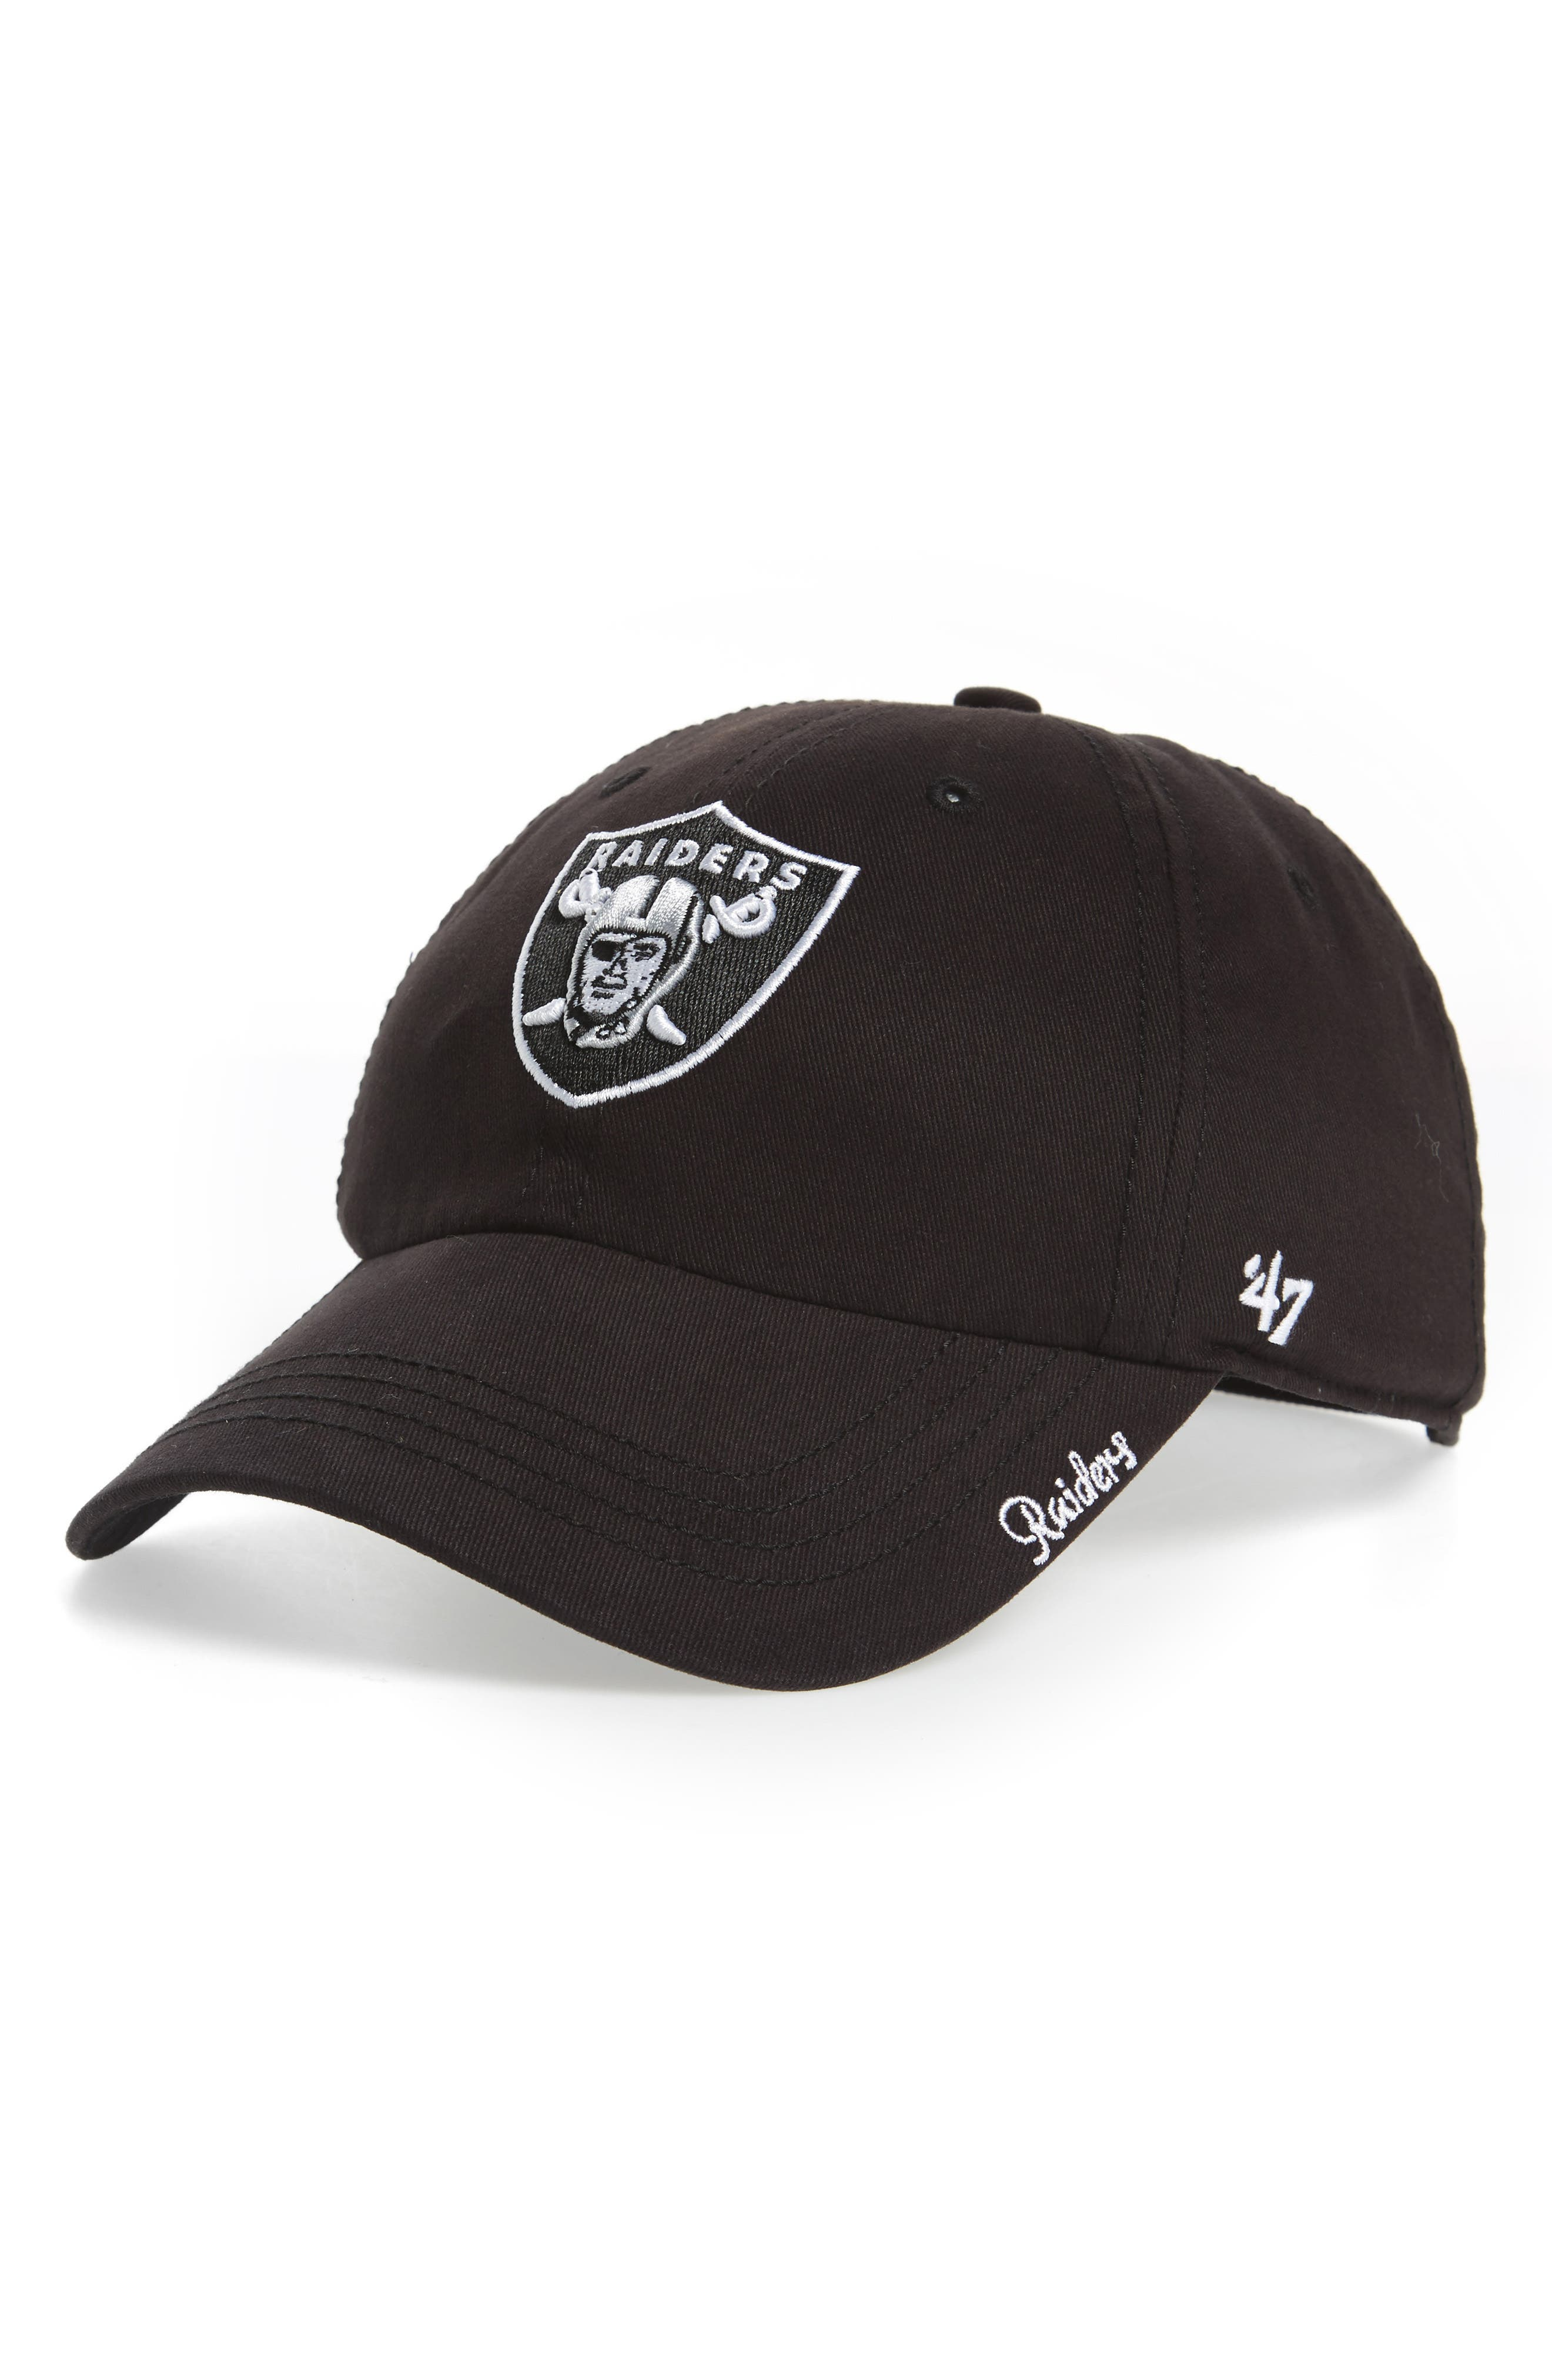 Miata Clean Up Oakland Raiders Ball Cap,                         Main,                         color, 001